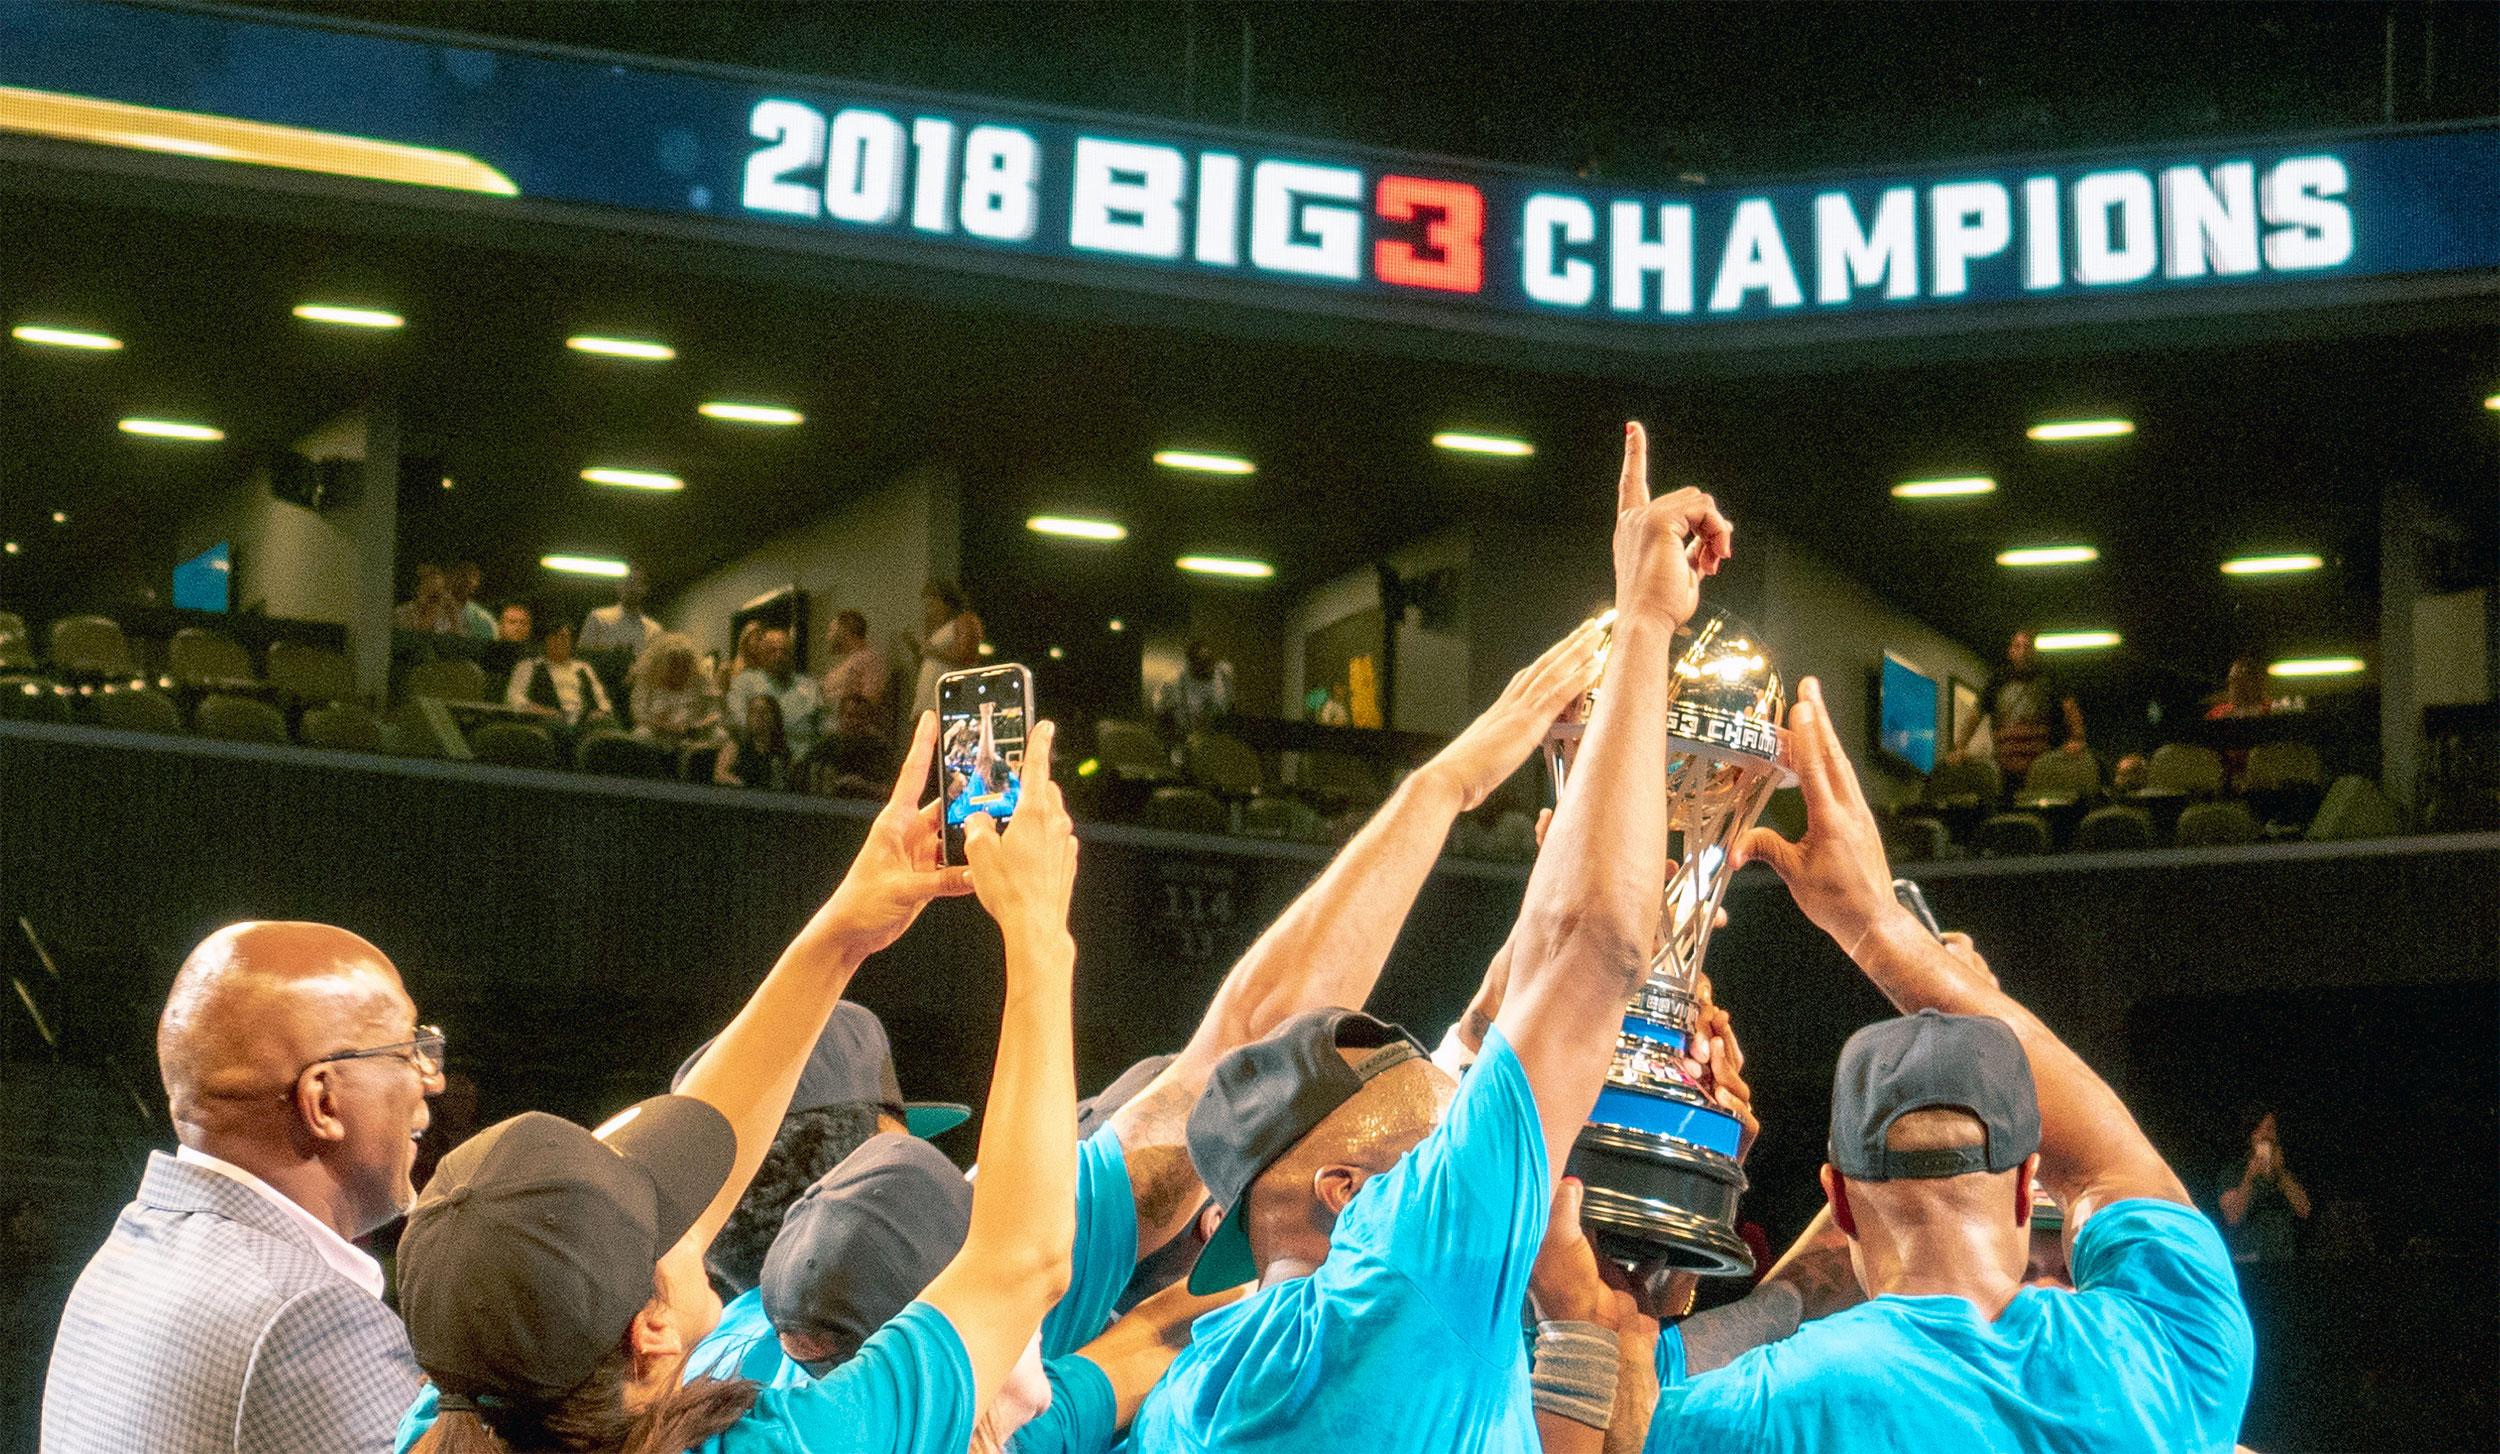 2018_BIG3-CHAMPIONS_18.jpg